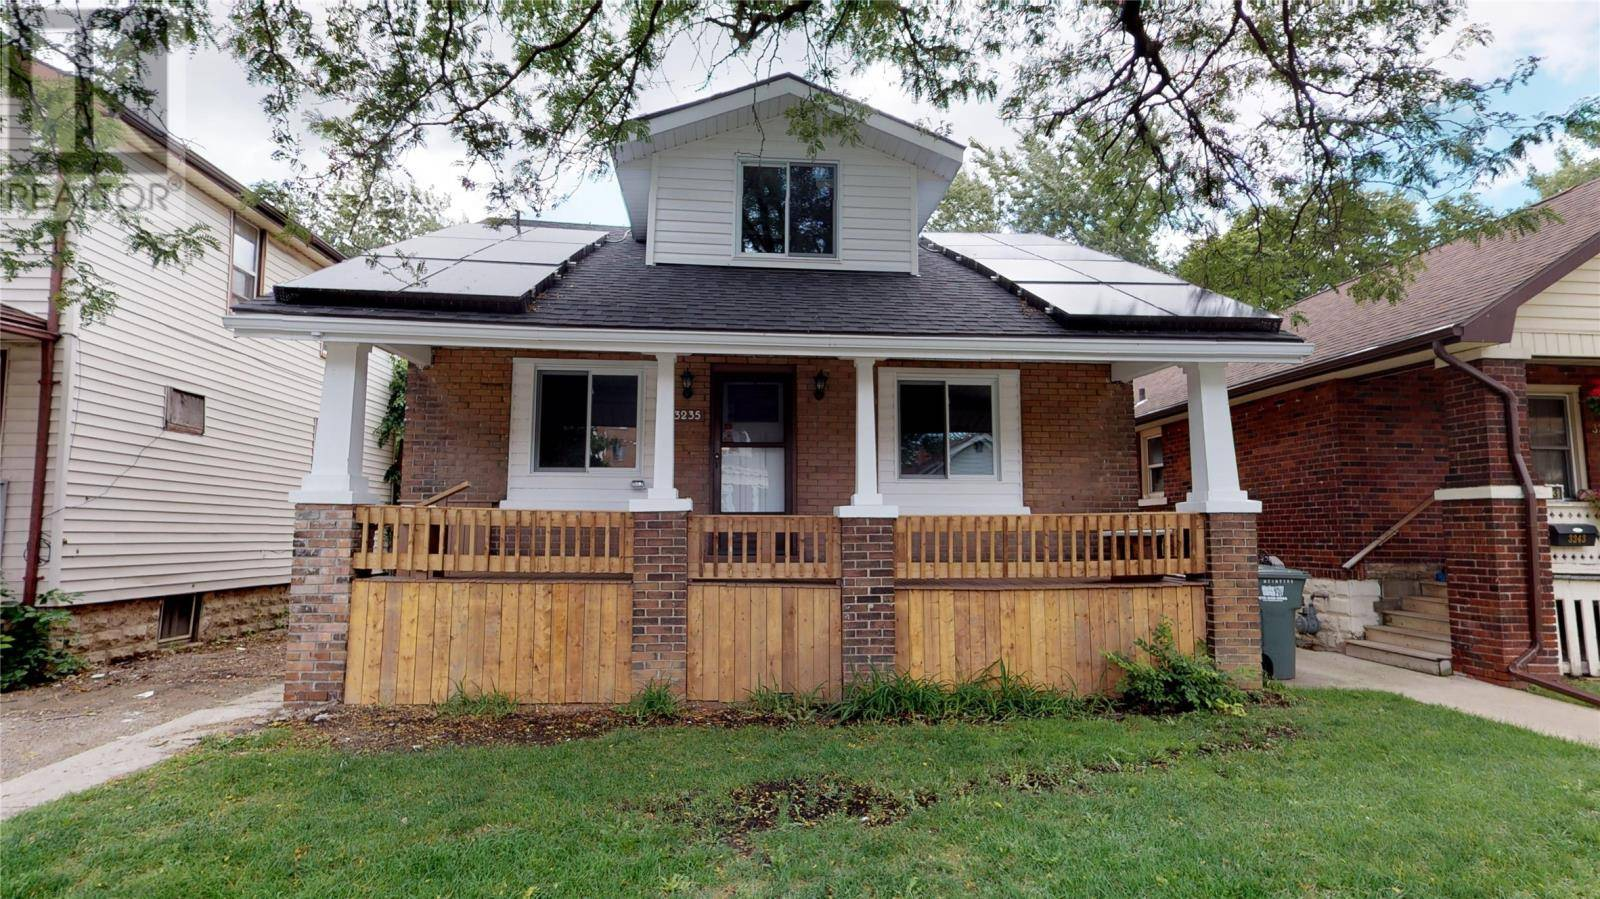 House for sale at 3235 Millen St Windsor Ontario - MLS: 19025318